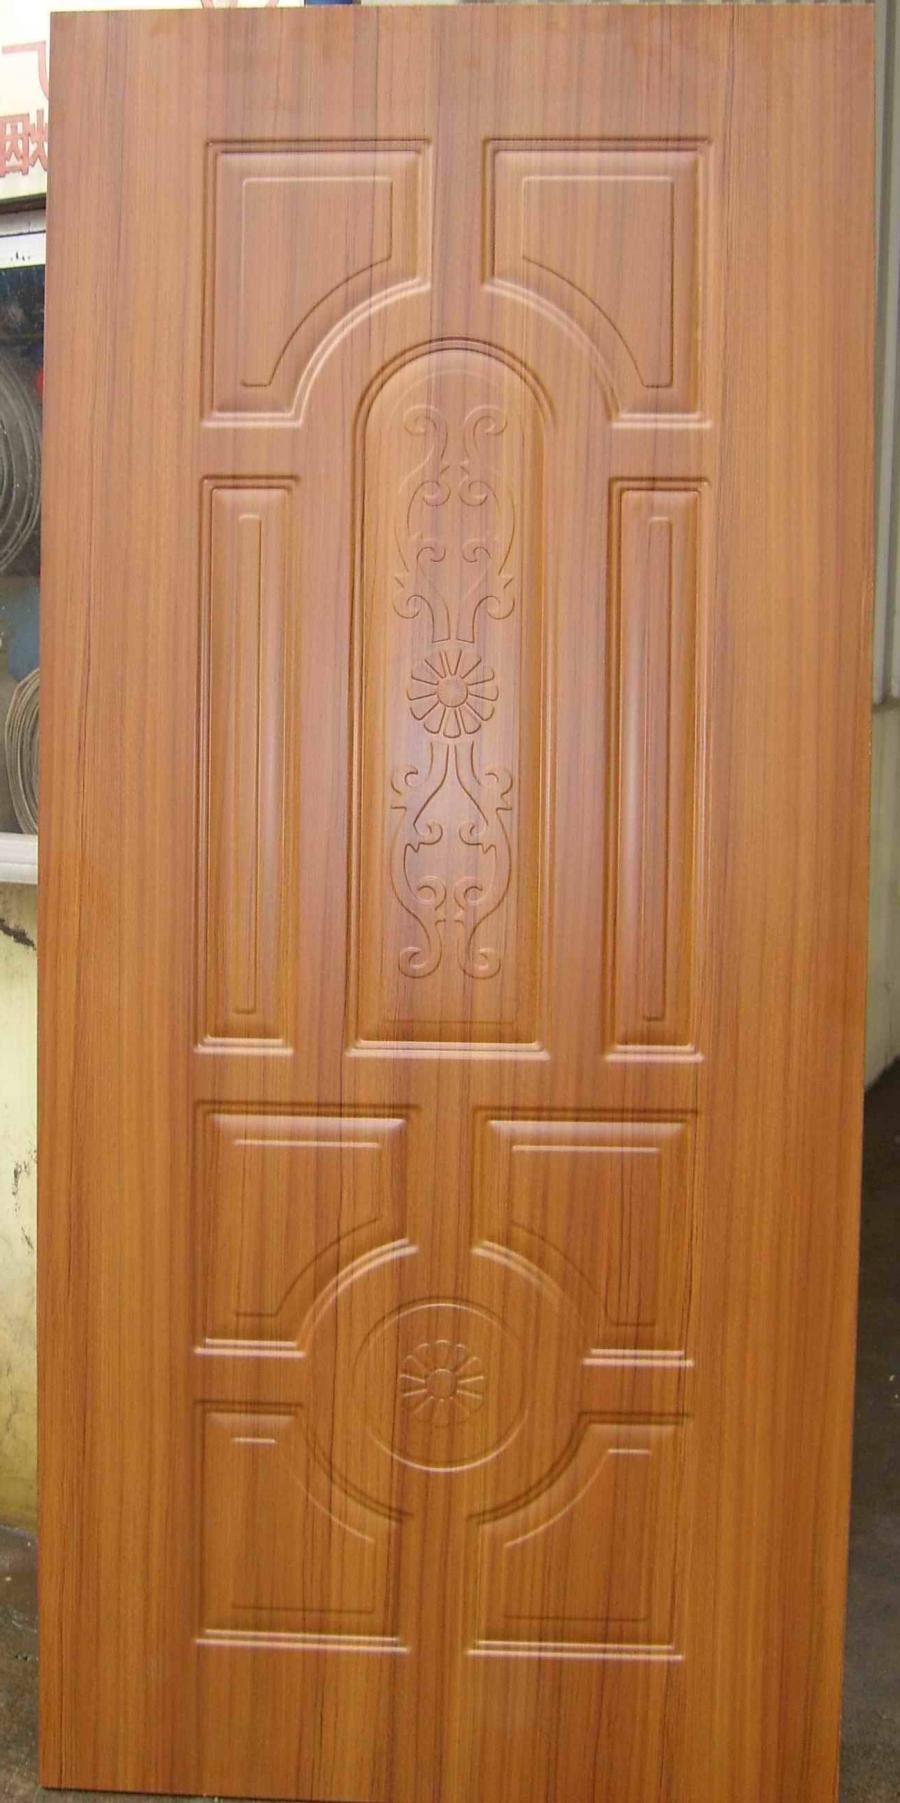 doors and windows design gallery in sri lanka  | 236 x 296